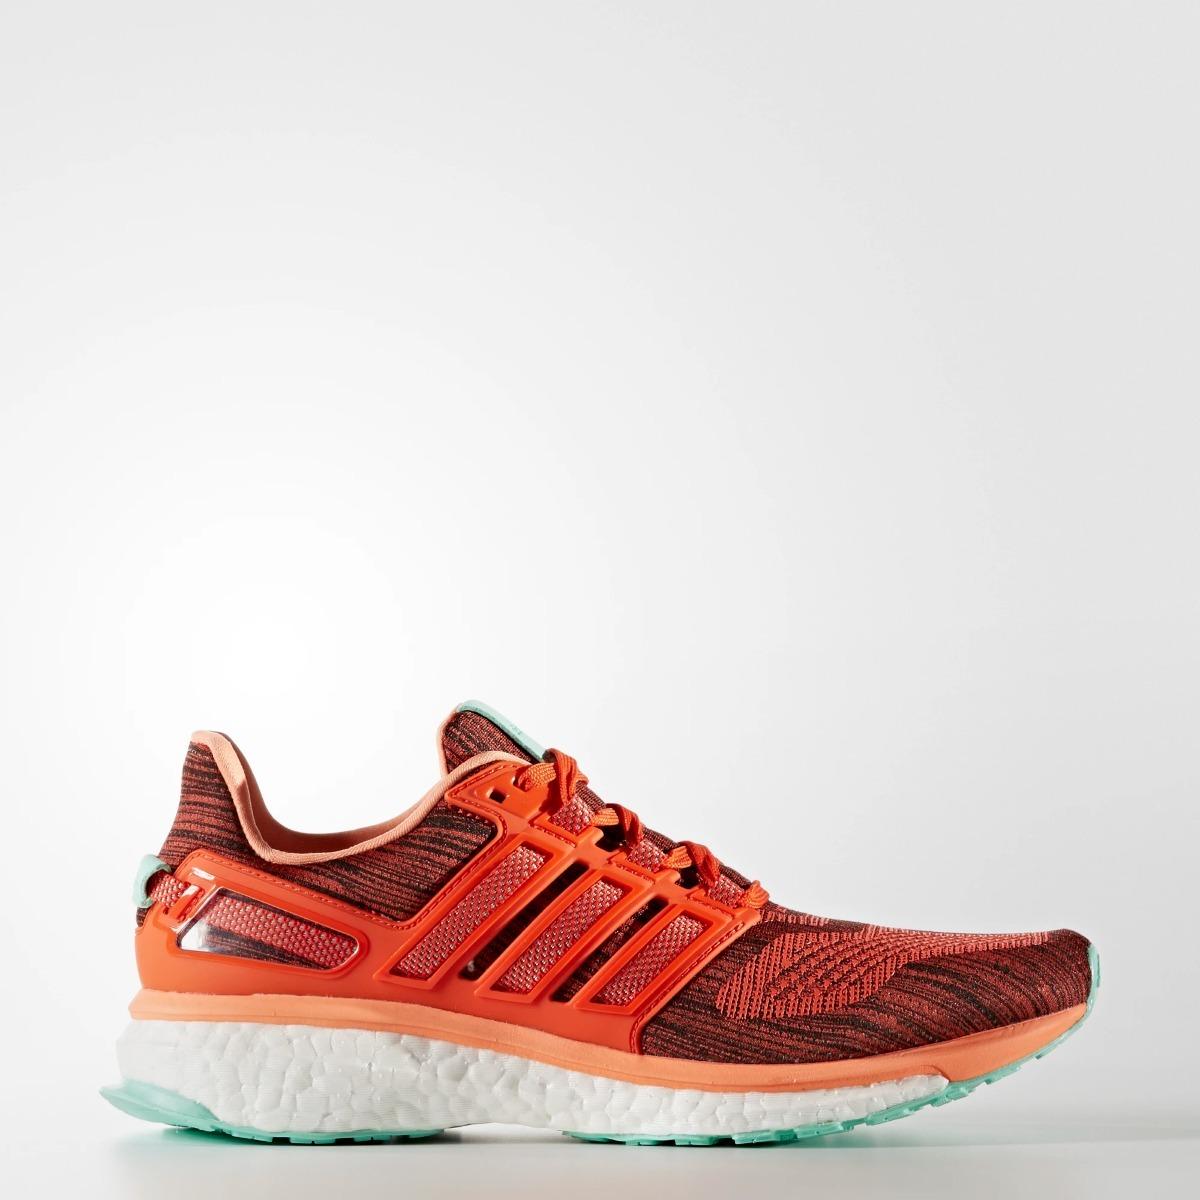 finest selection 6f622 fbd7a zapatillas adidas energy boost 3 mujer running envio gratis. Cargando zoom.